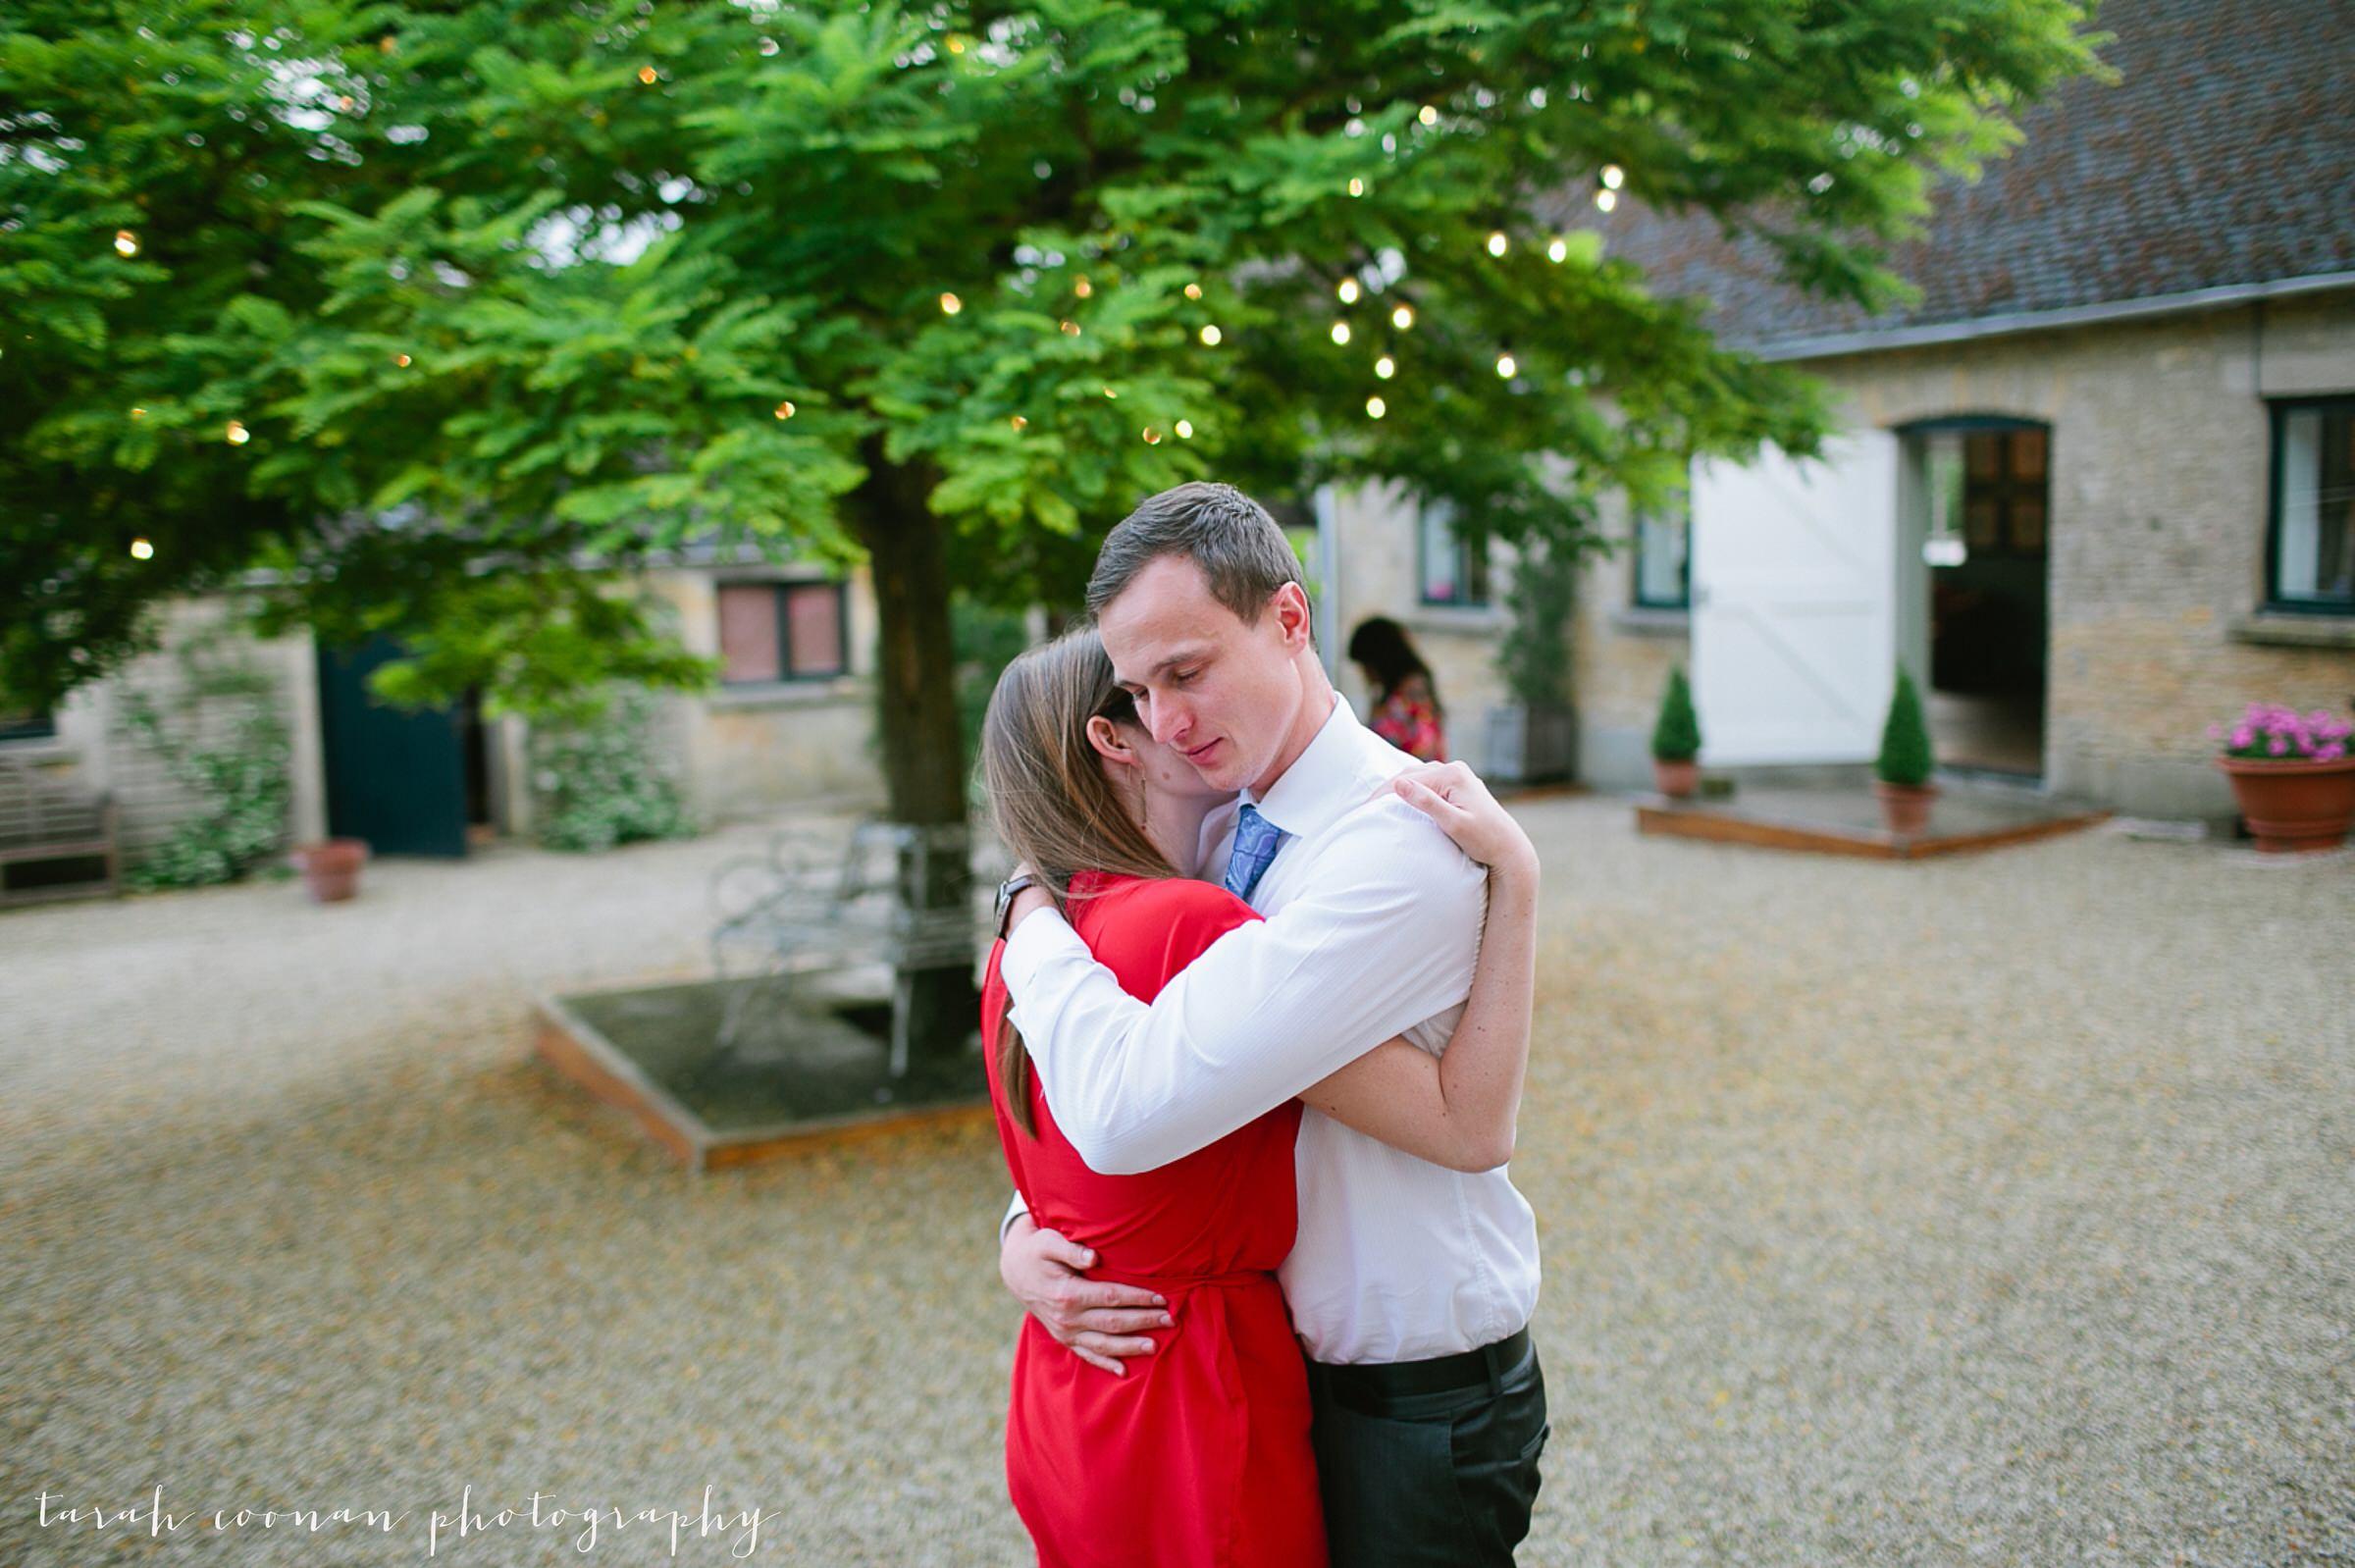 brighton-wedding-photographer57